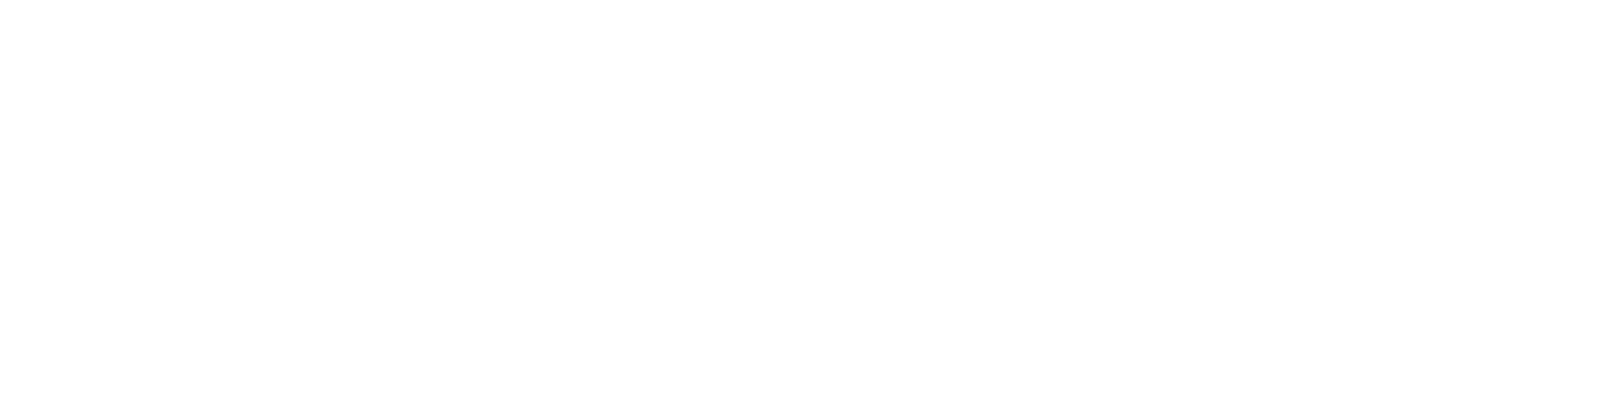 SL-Lancaster-Park-Logo-2020-horizontal-White